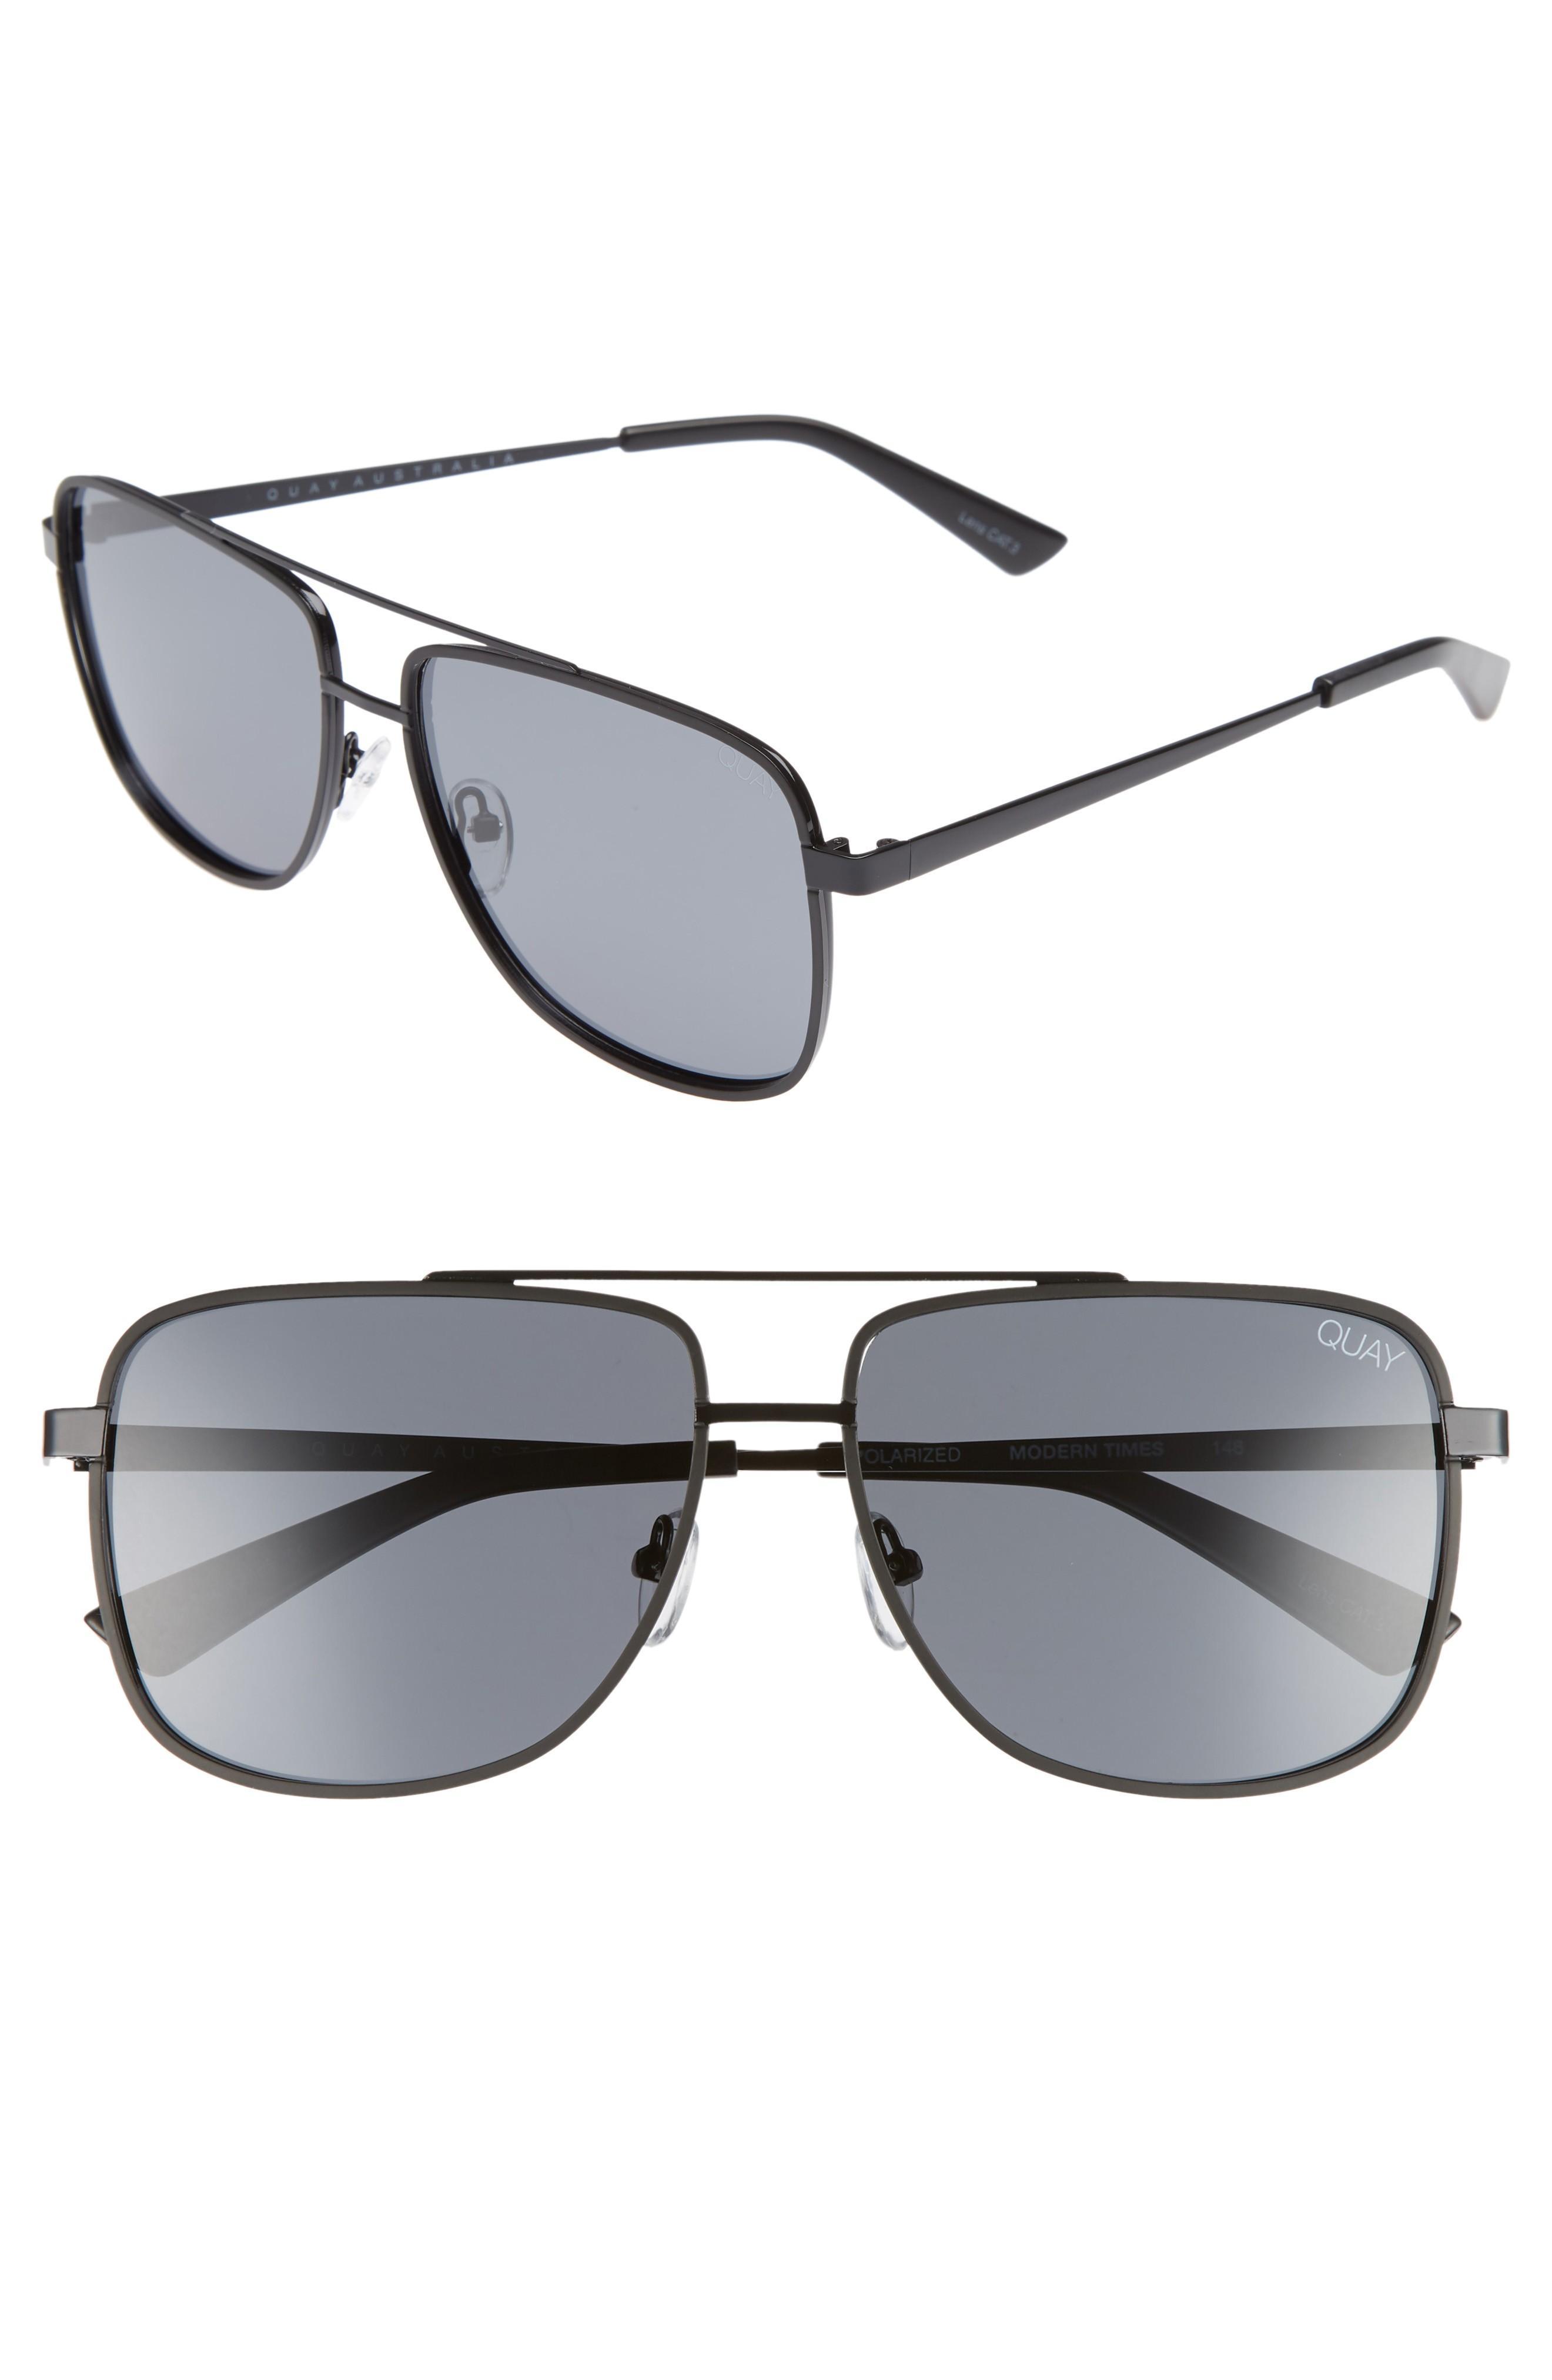 e0d974a601 Quay Modern Times 57Mm Polarized Aviator Sunglasses In Black   Smoke ...